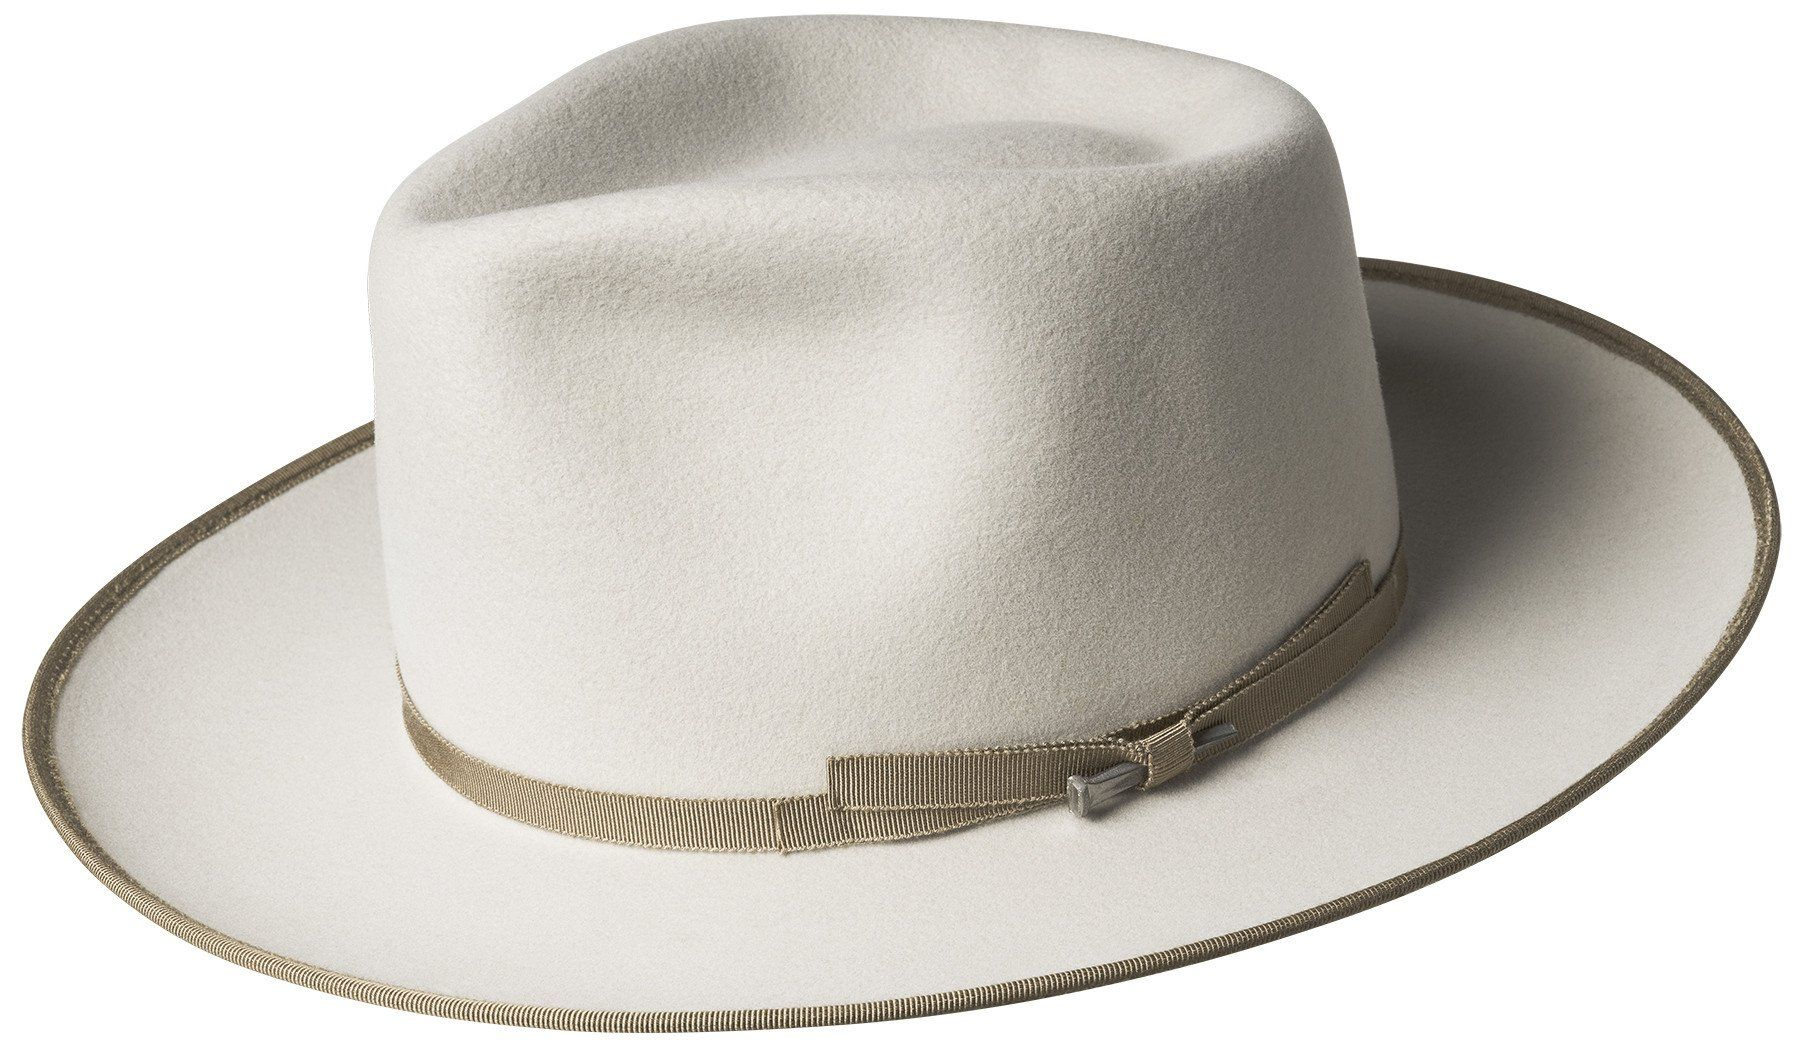 f1e4e46419f60a Bailey Colver in 2019   hats   Hats, Stylish hats, Dress hats